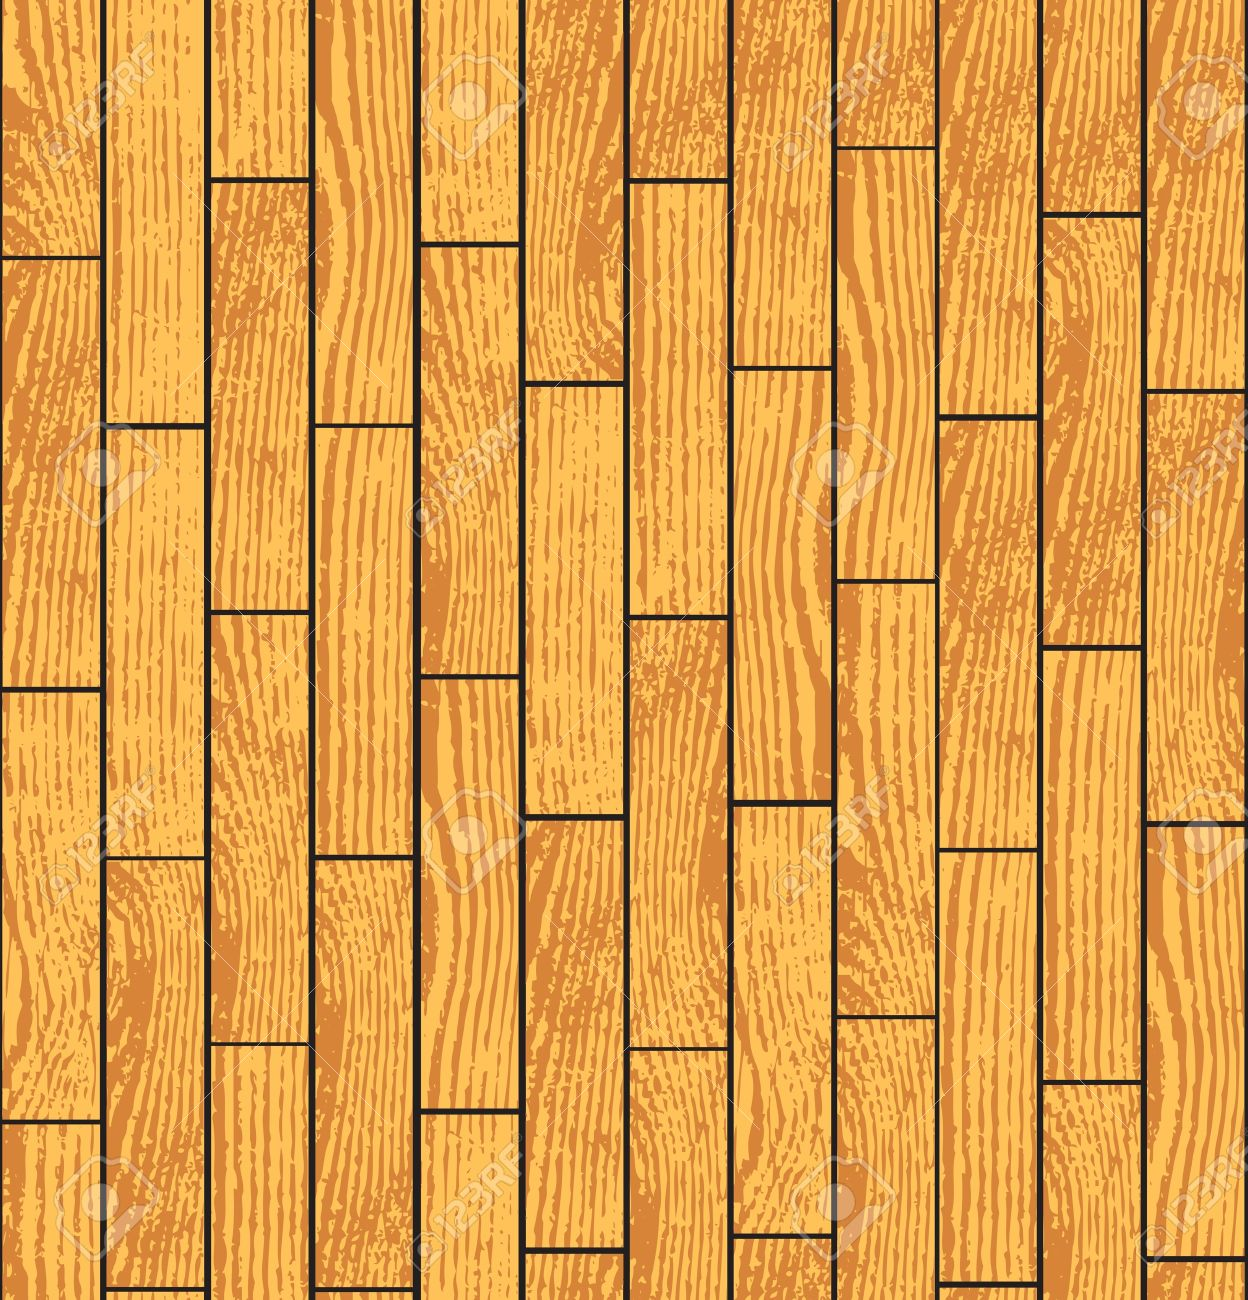 Grunge Wood Parquet Texture, Seamless Background Royalty Free.